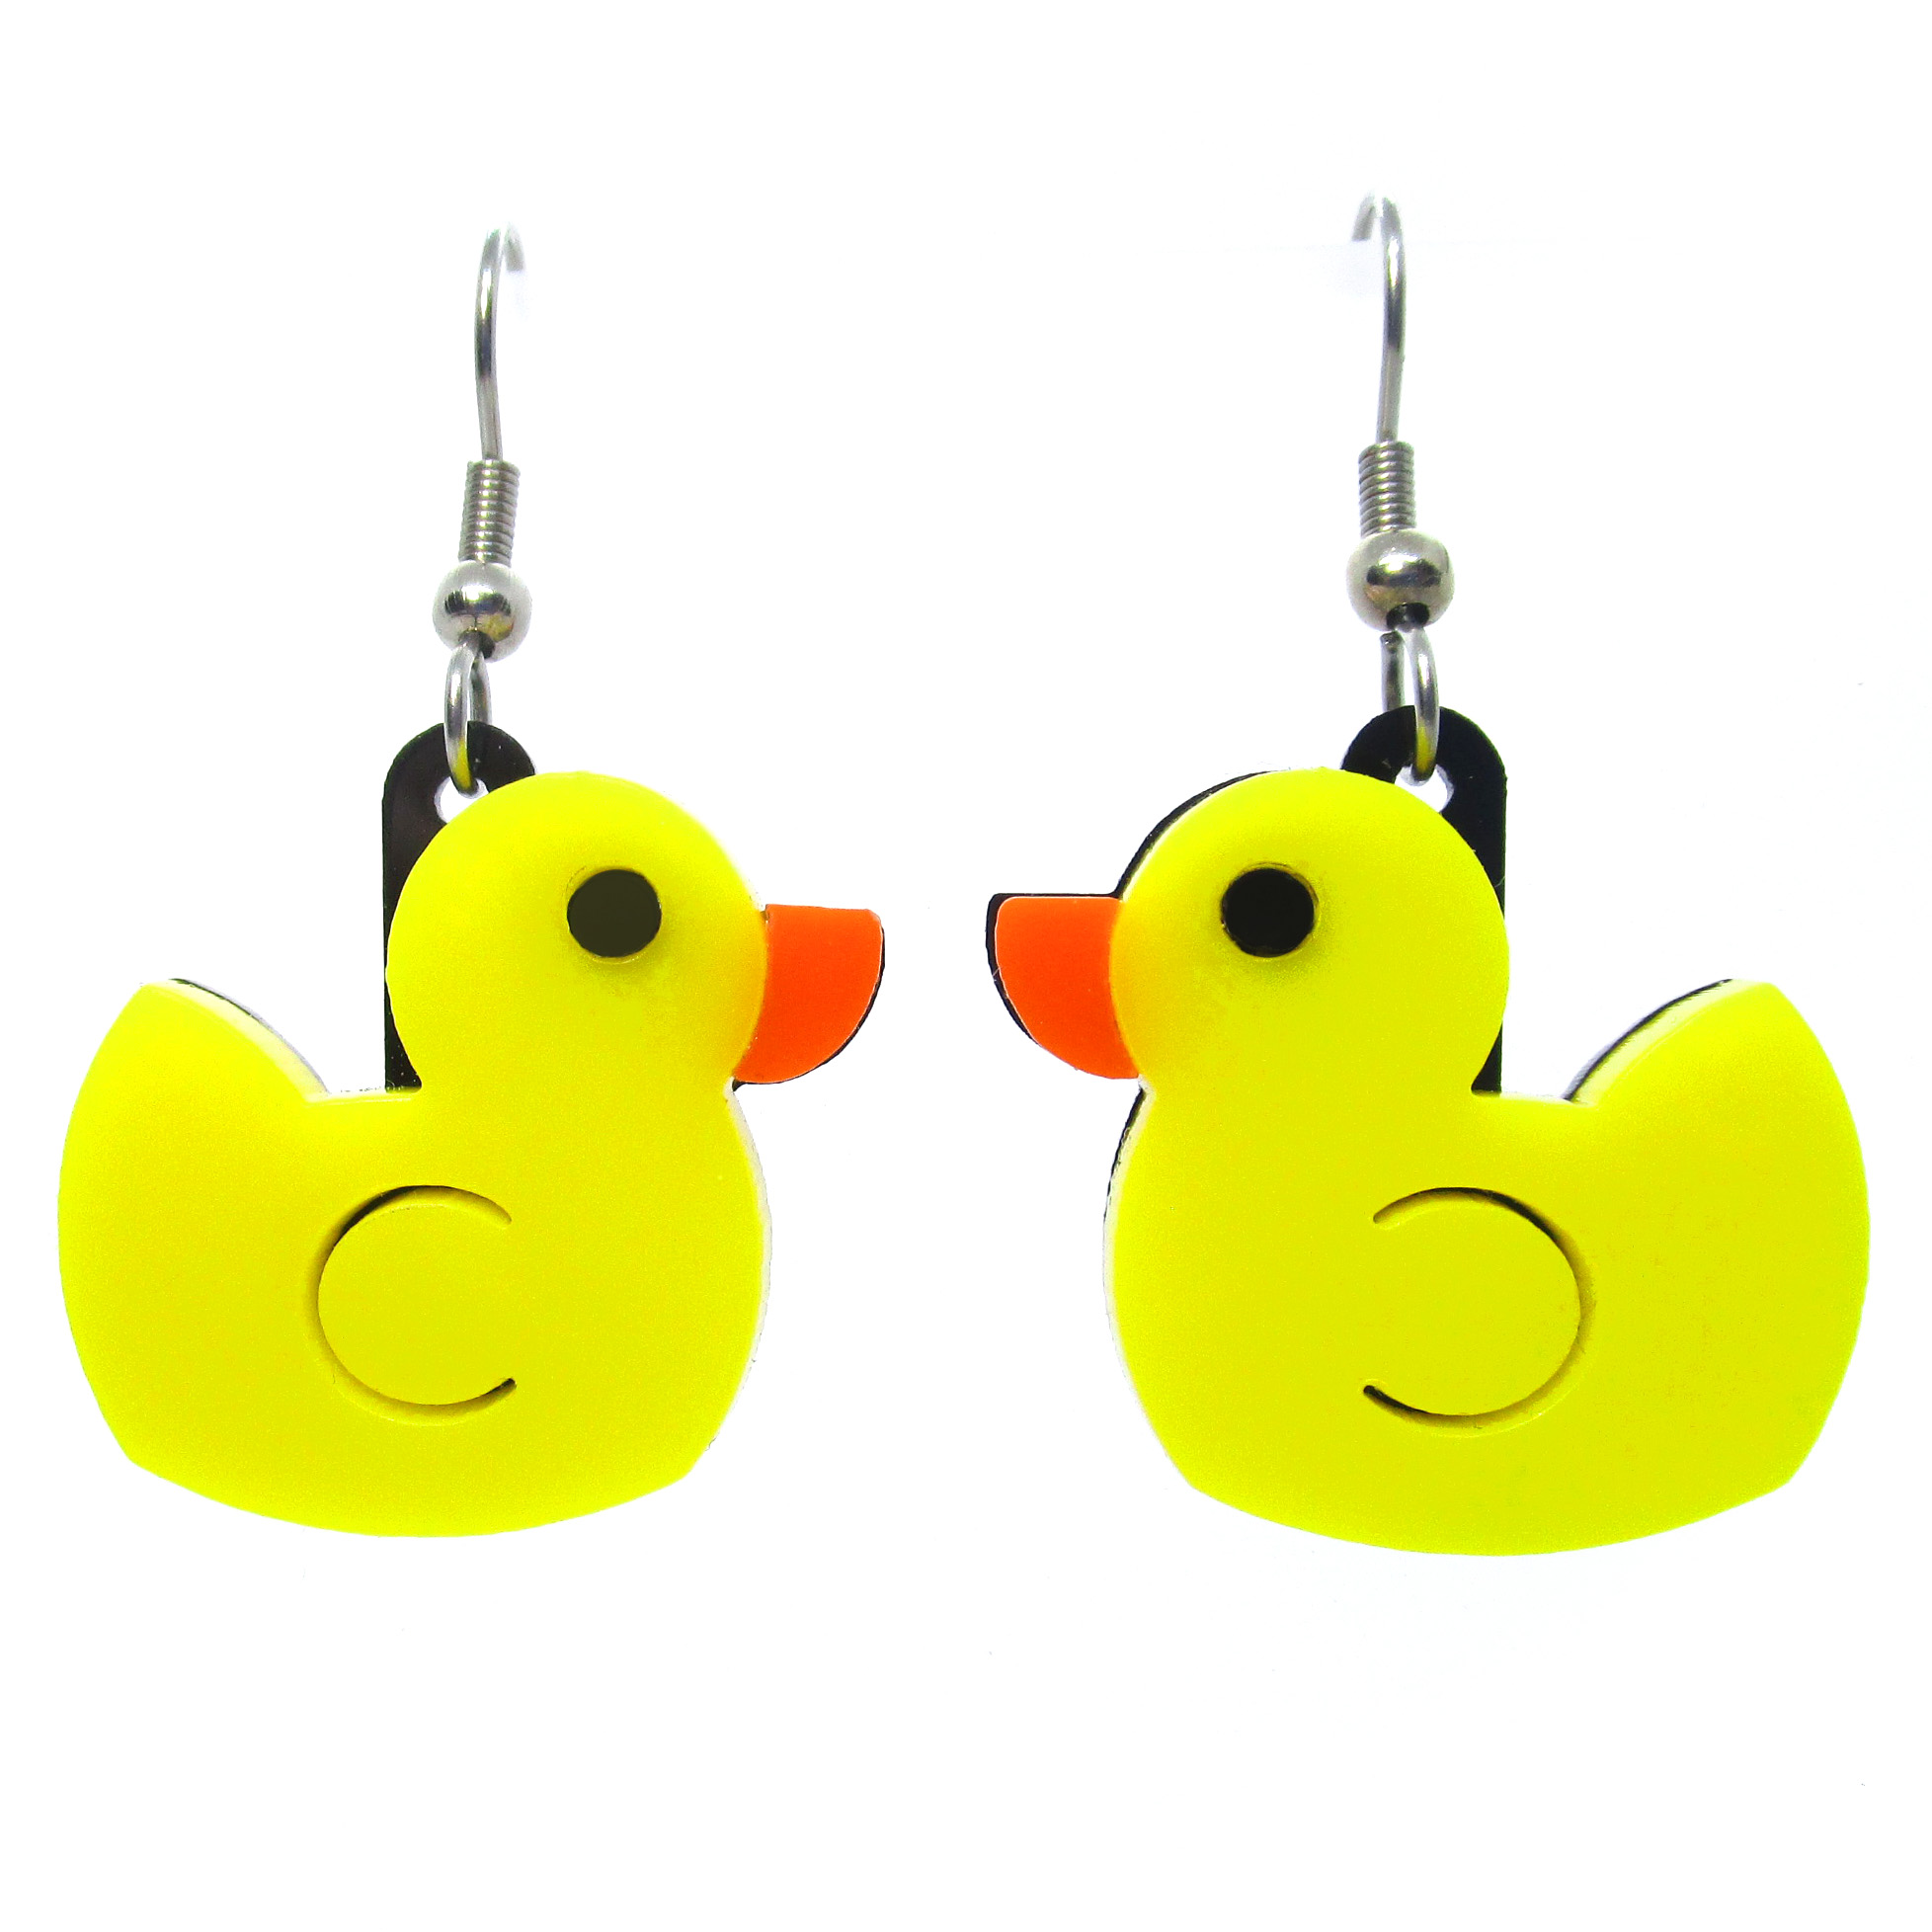 rubber duck dangle earrings on white background